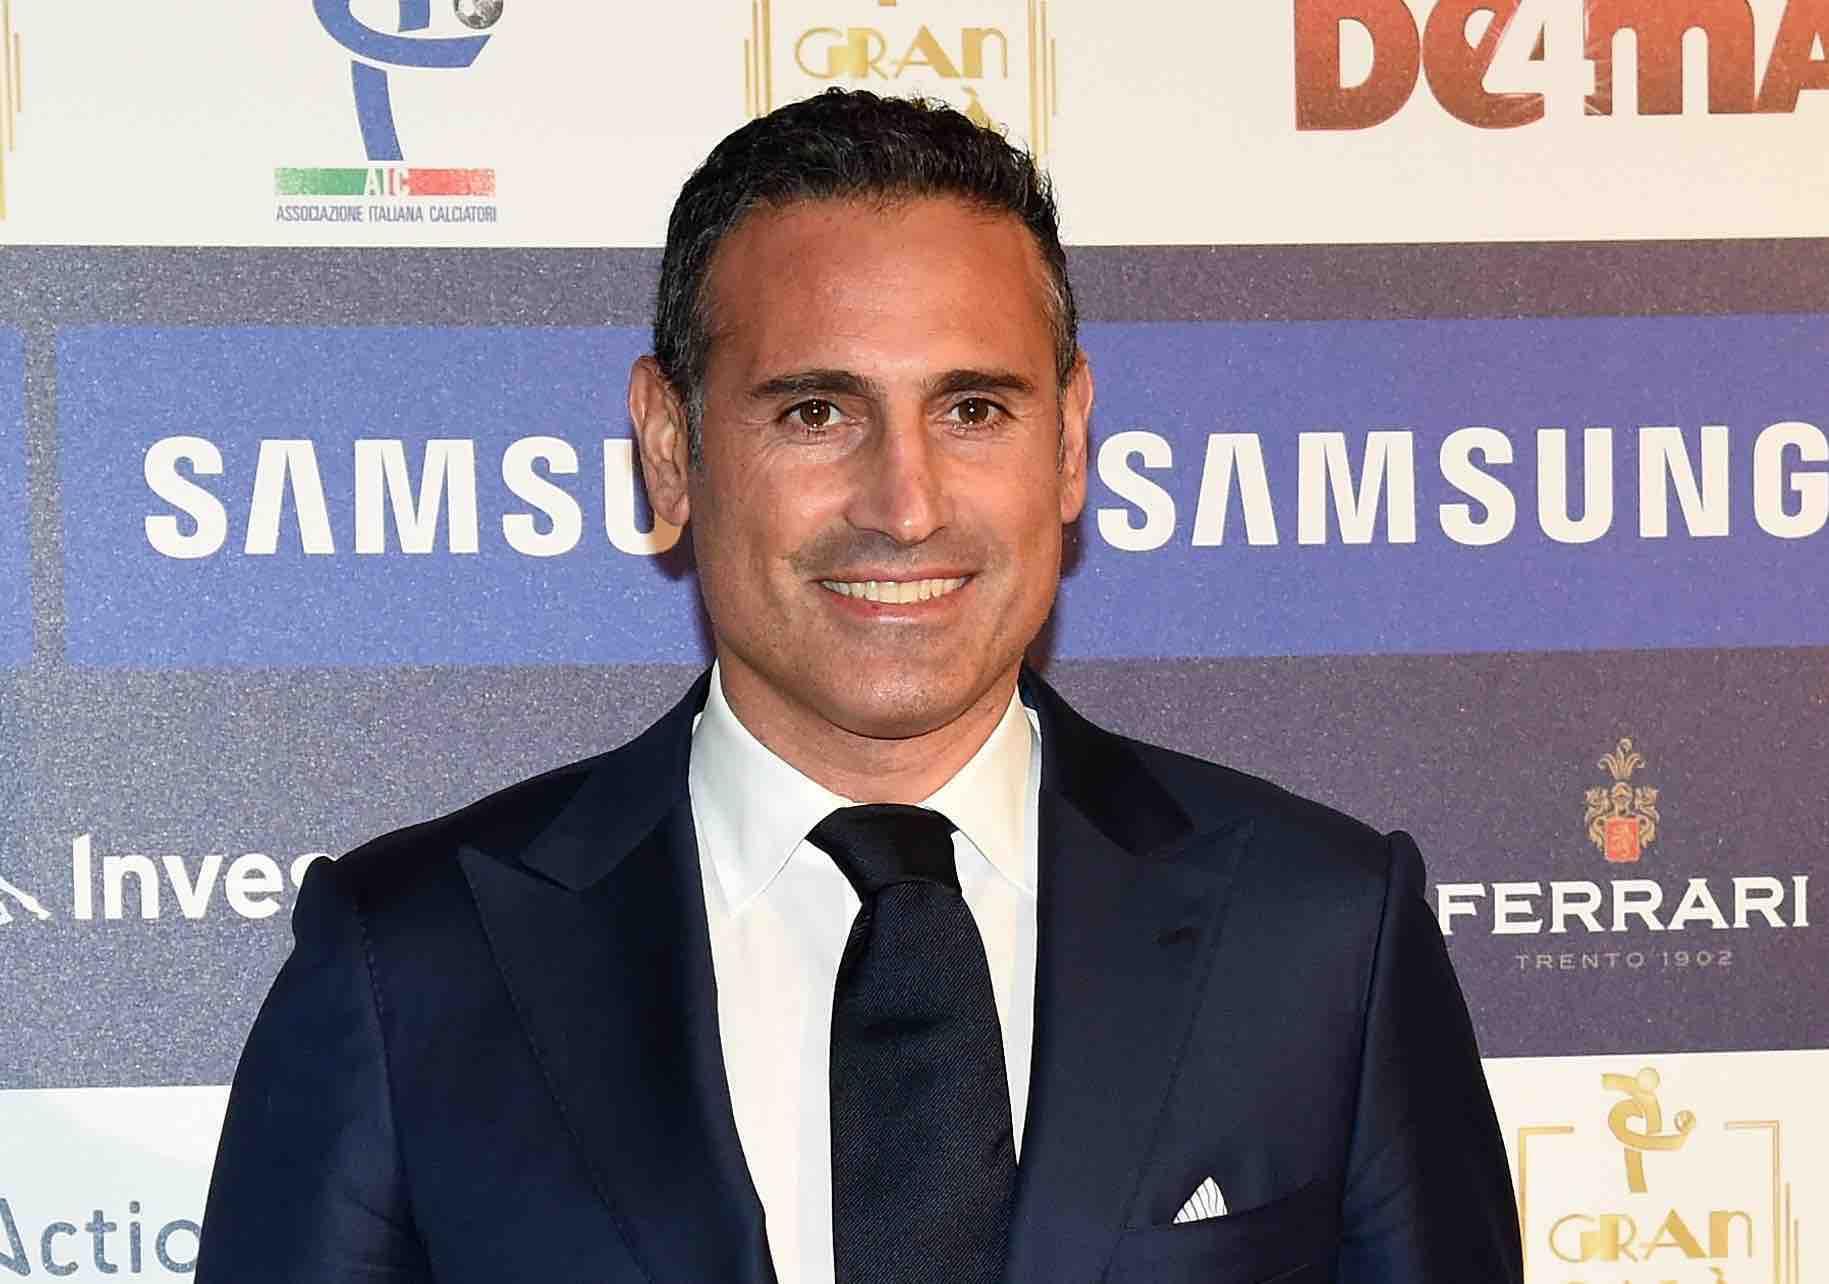 Nicola Amoruso commenta la sconfitta della Juventus